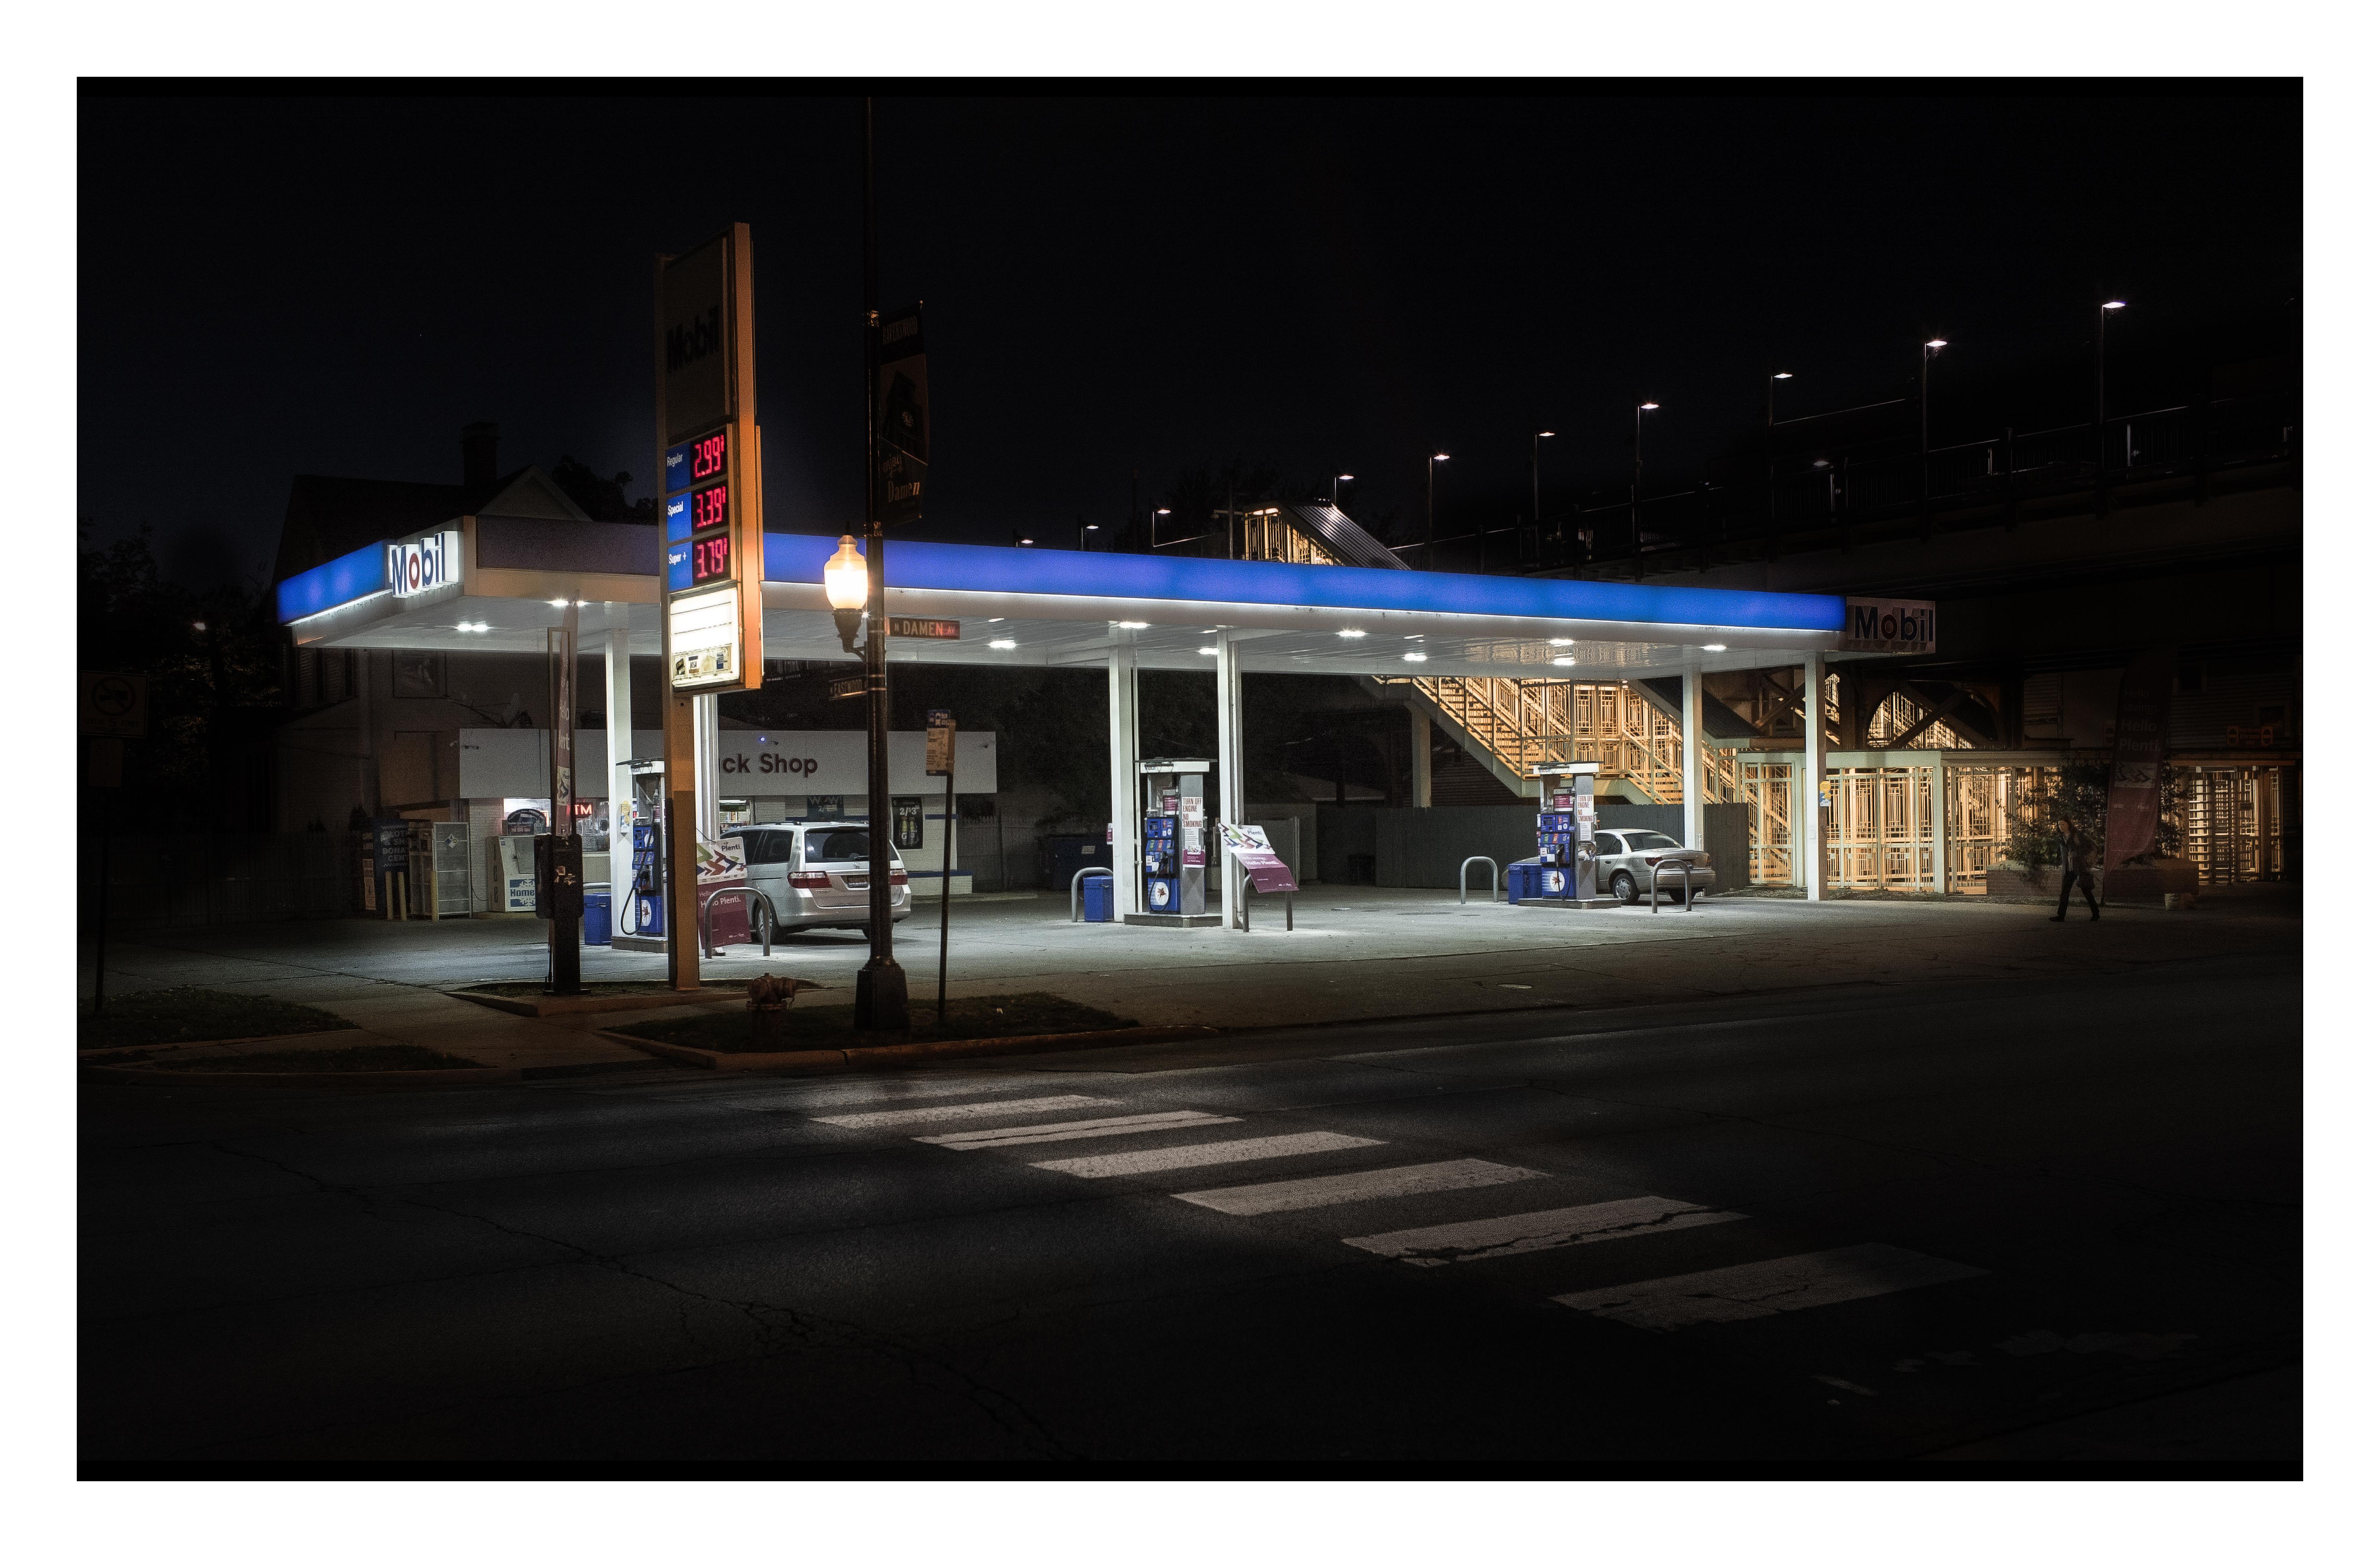 damen-station3